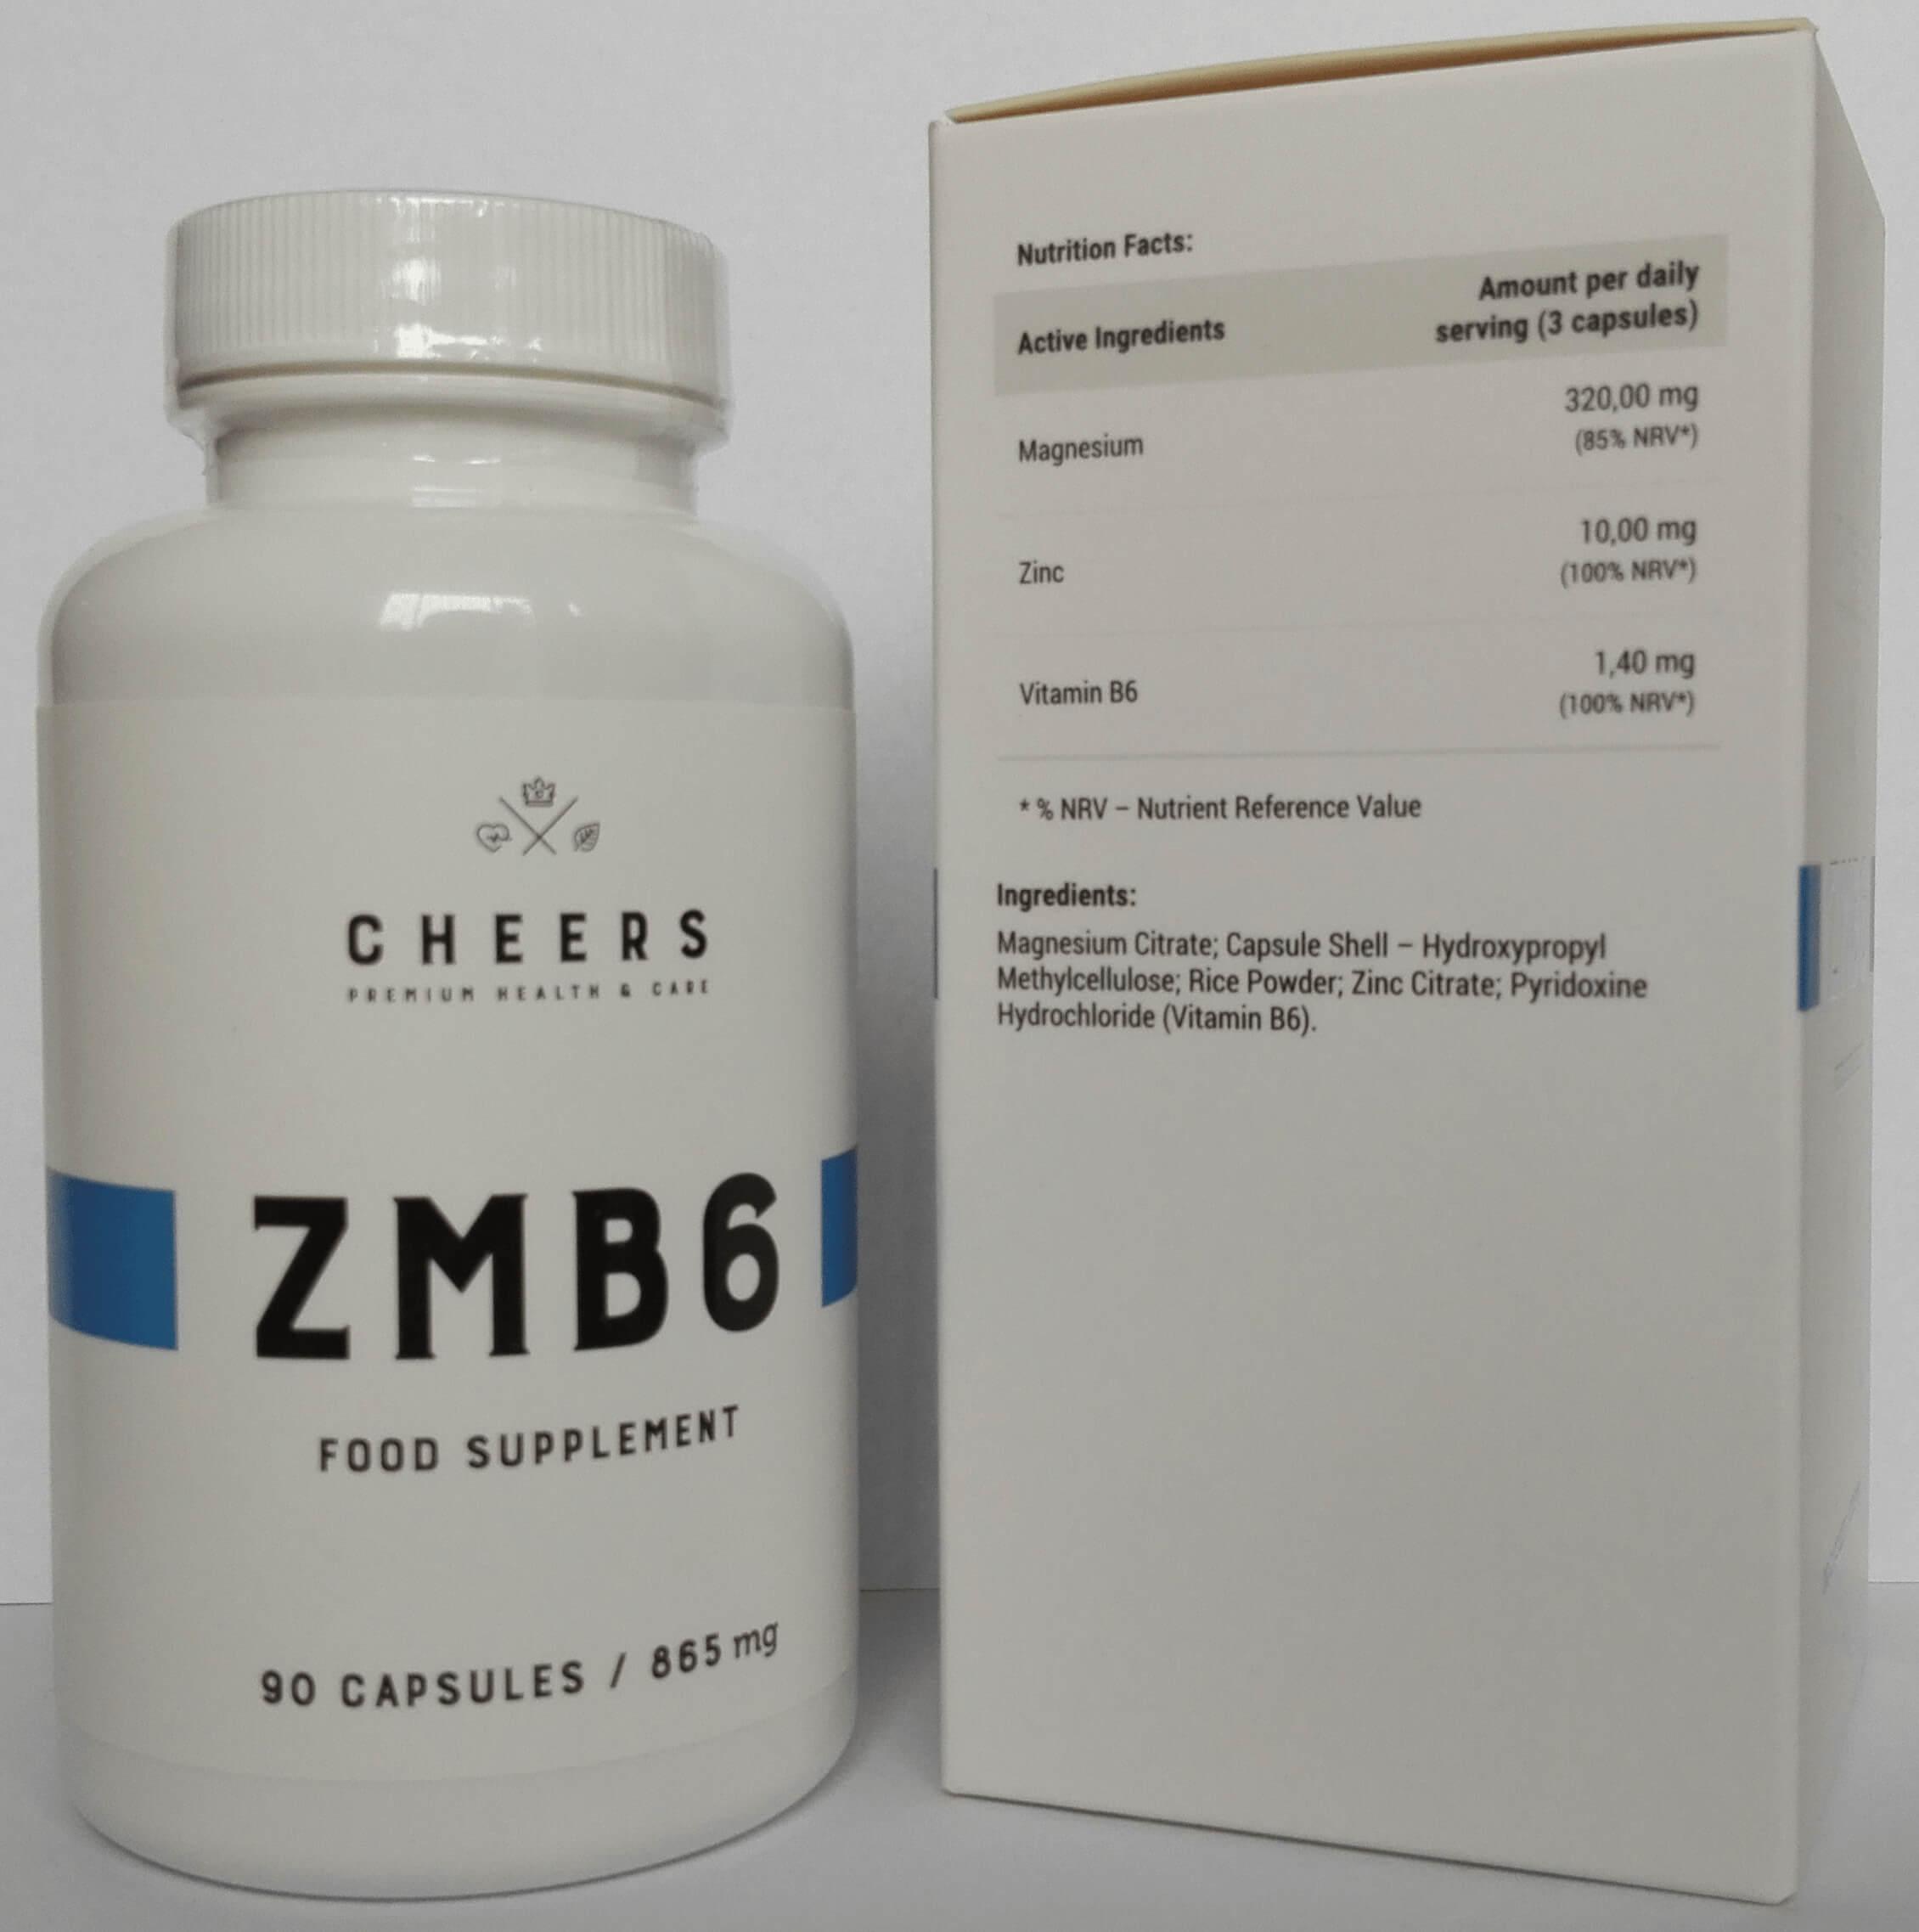 ZMB6 CHEERS